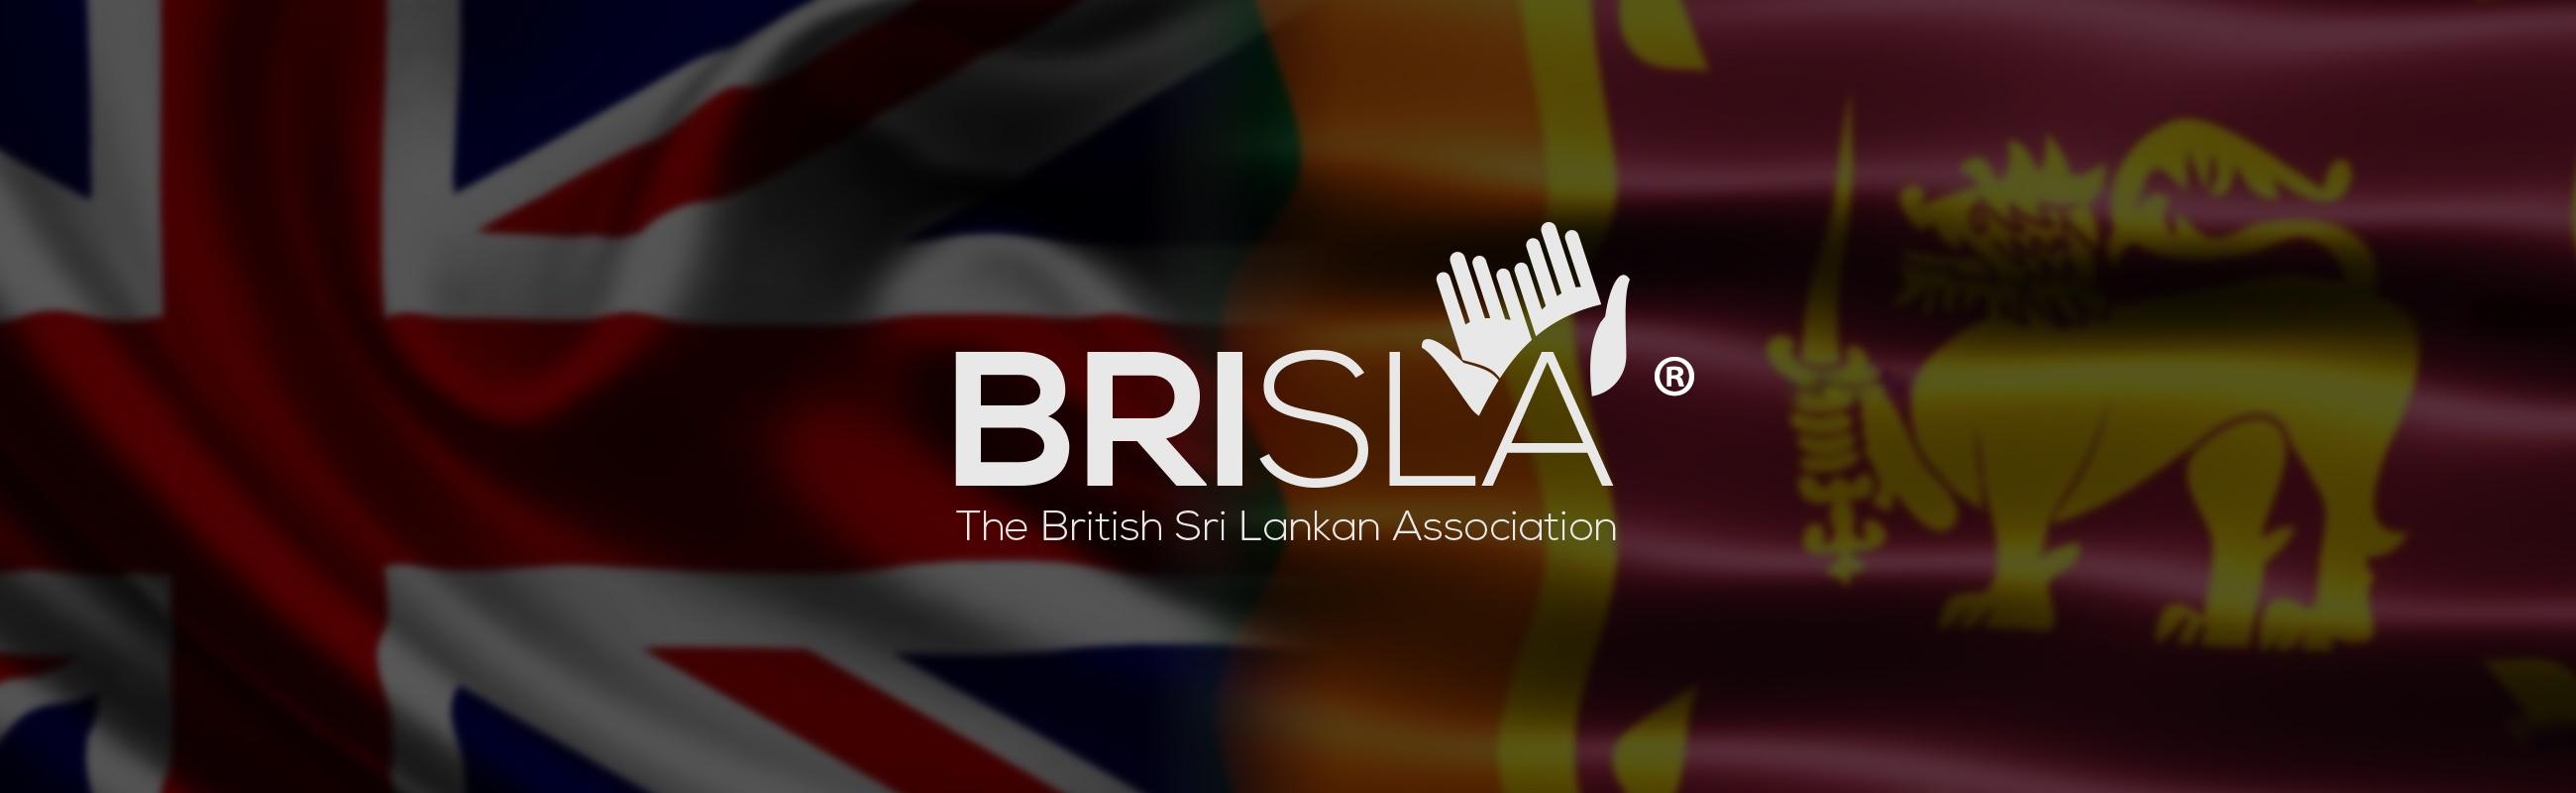 brisla-banner